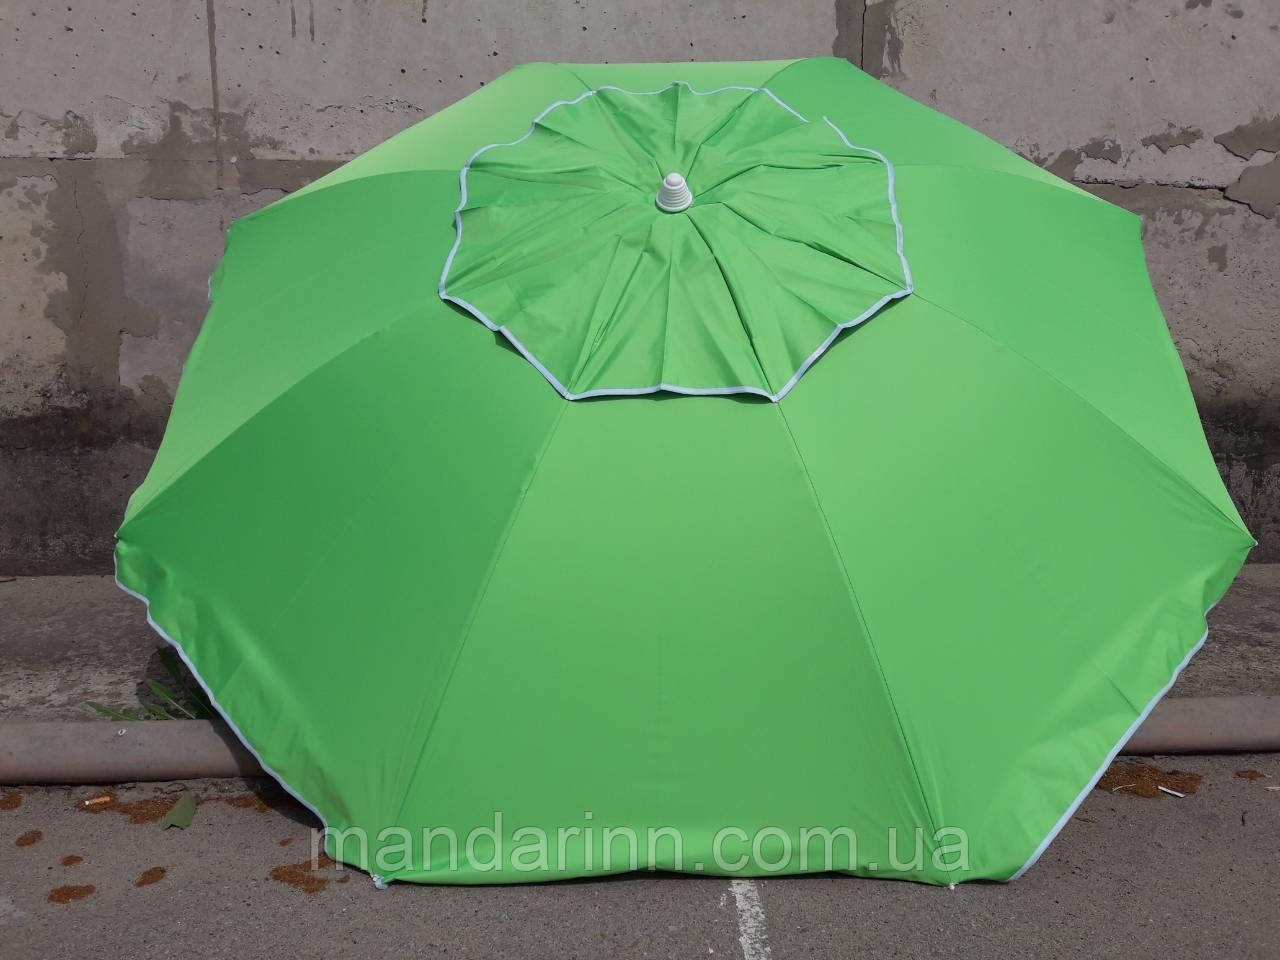 Пляжний зонт 1,8 м клапан нахил чохол червоний - фото 7